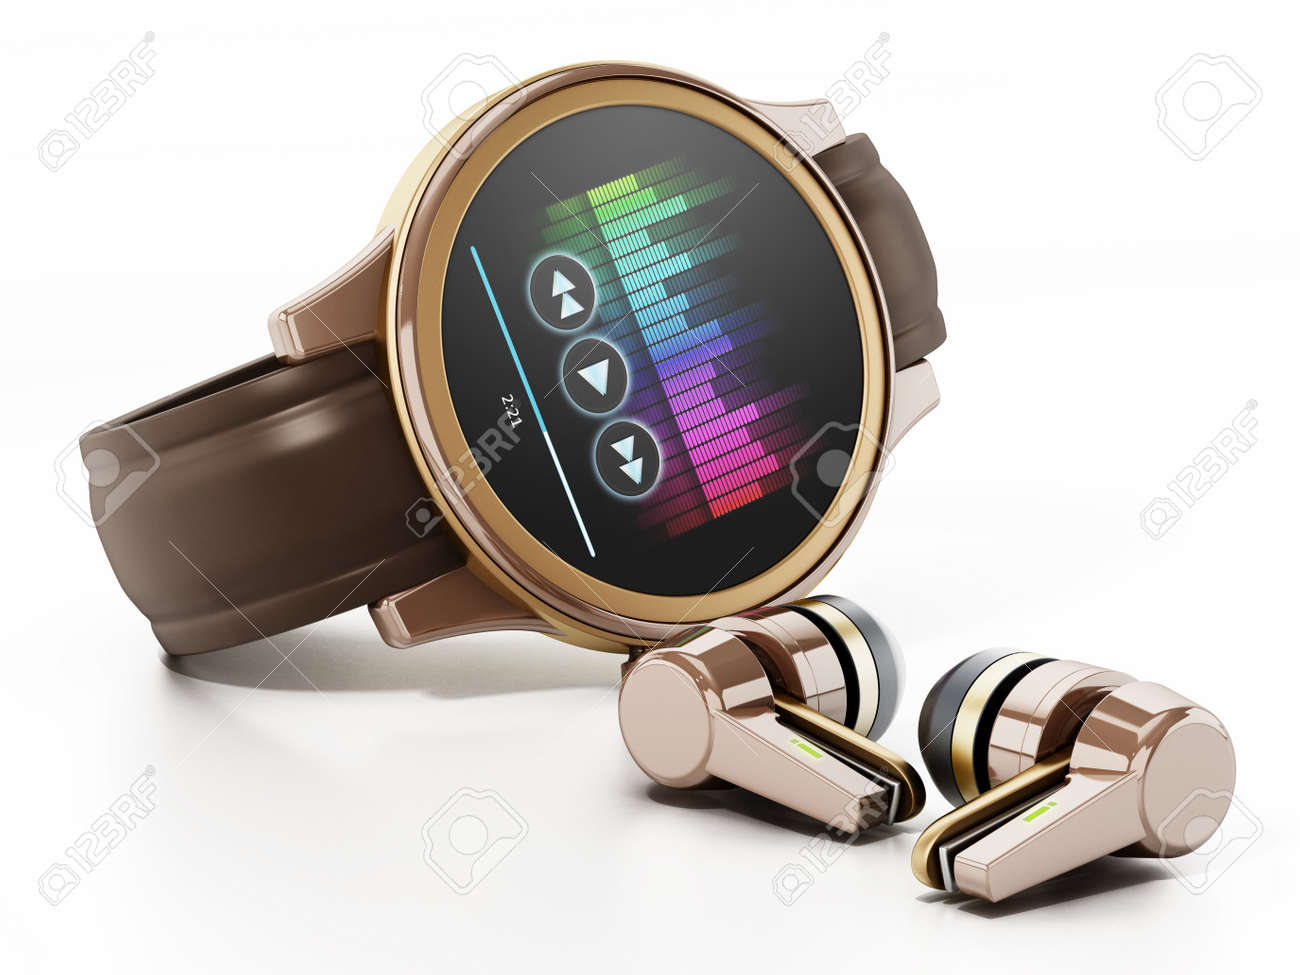 Generic smartwatch and wireless earphones. 3D illustration. - 173109645